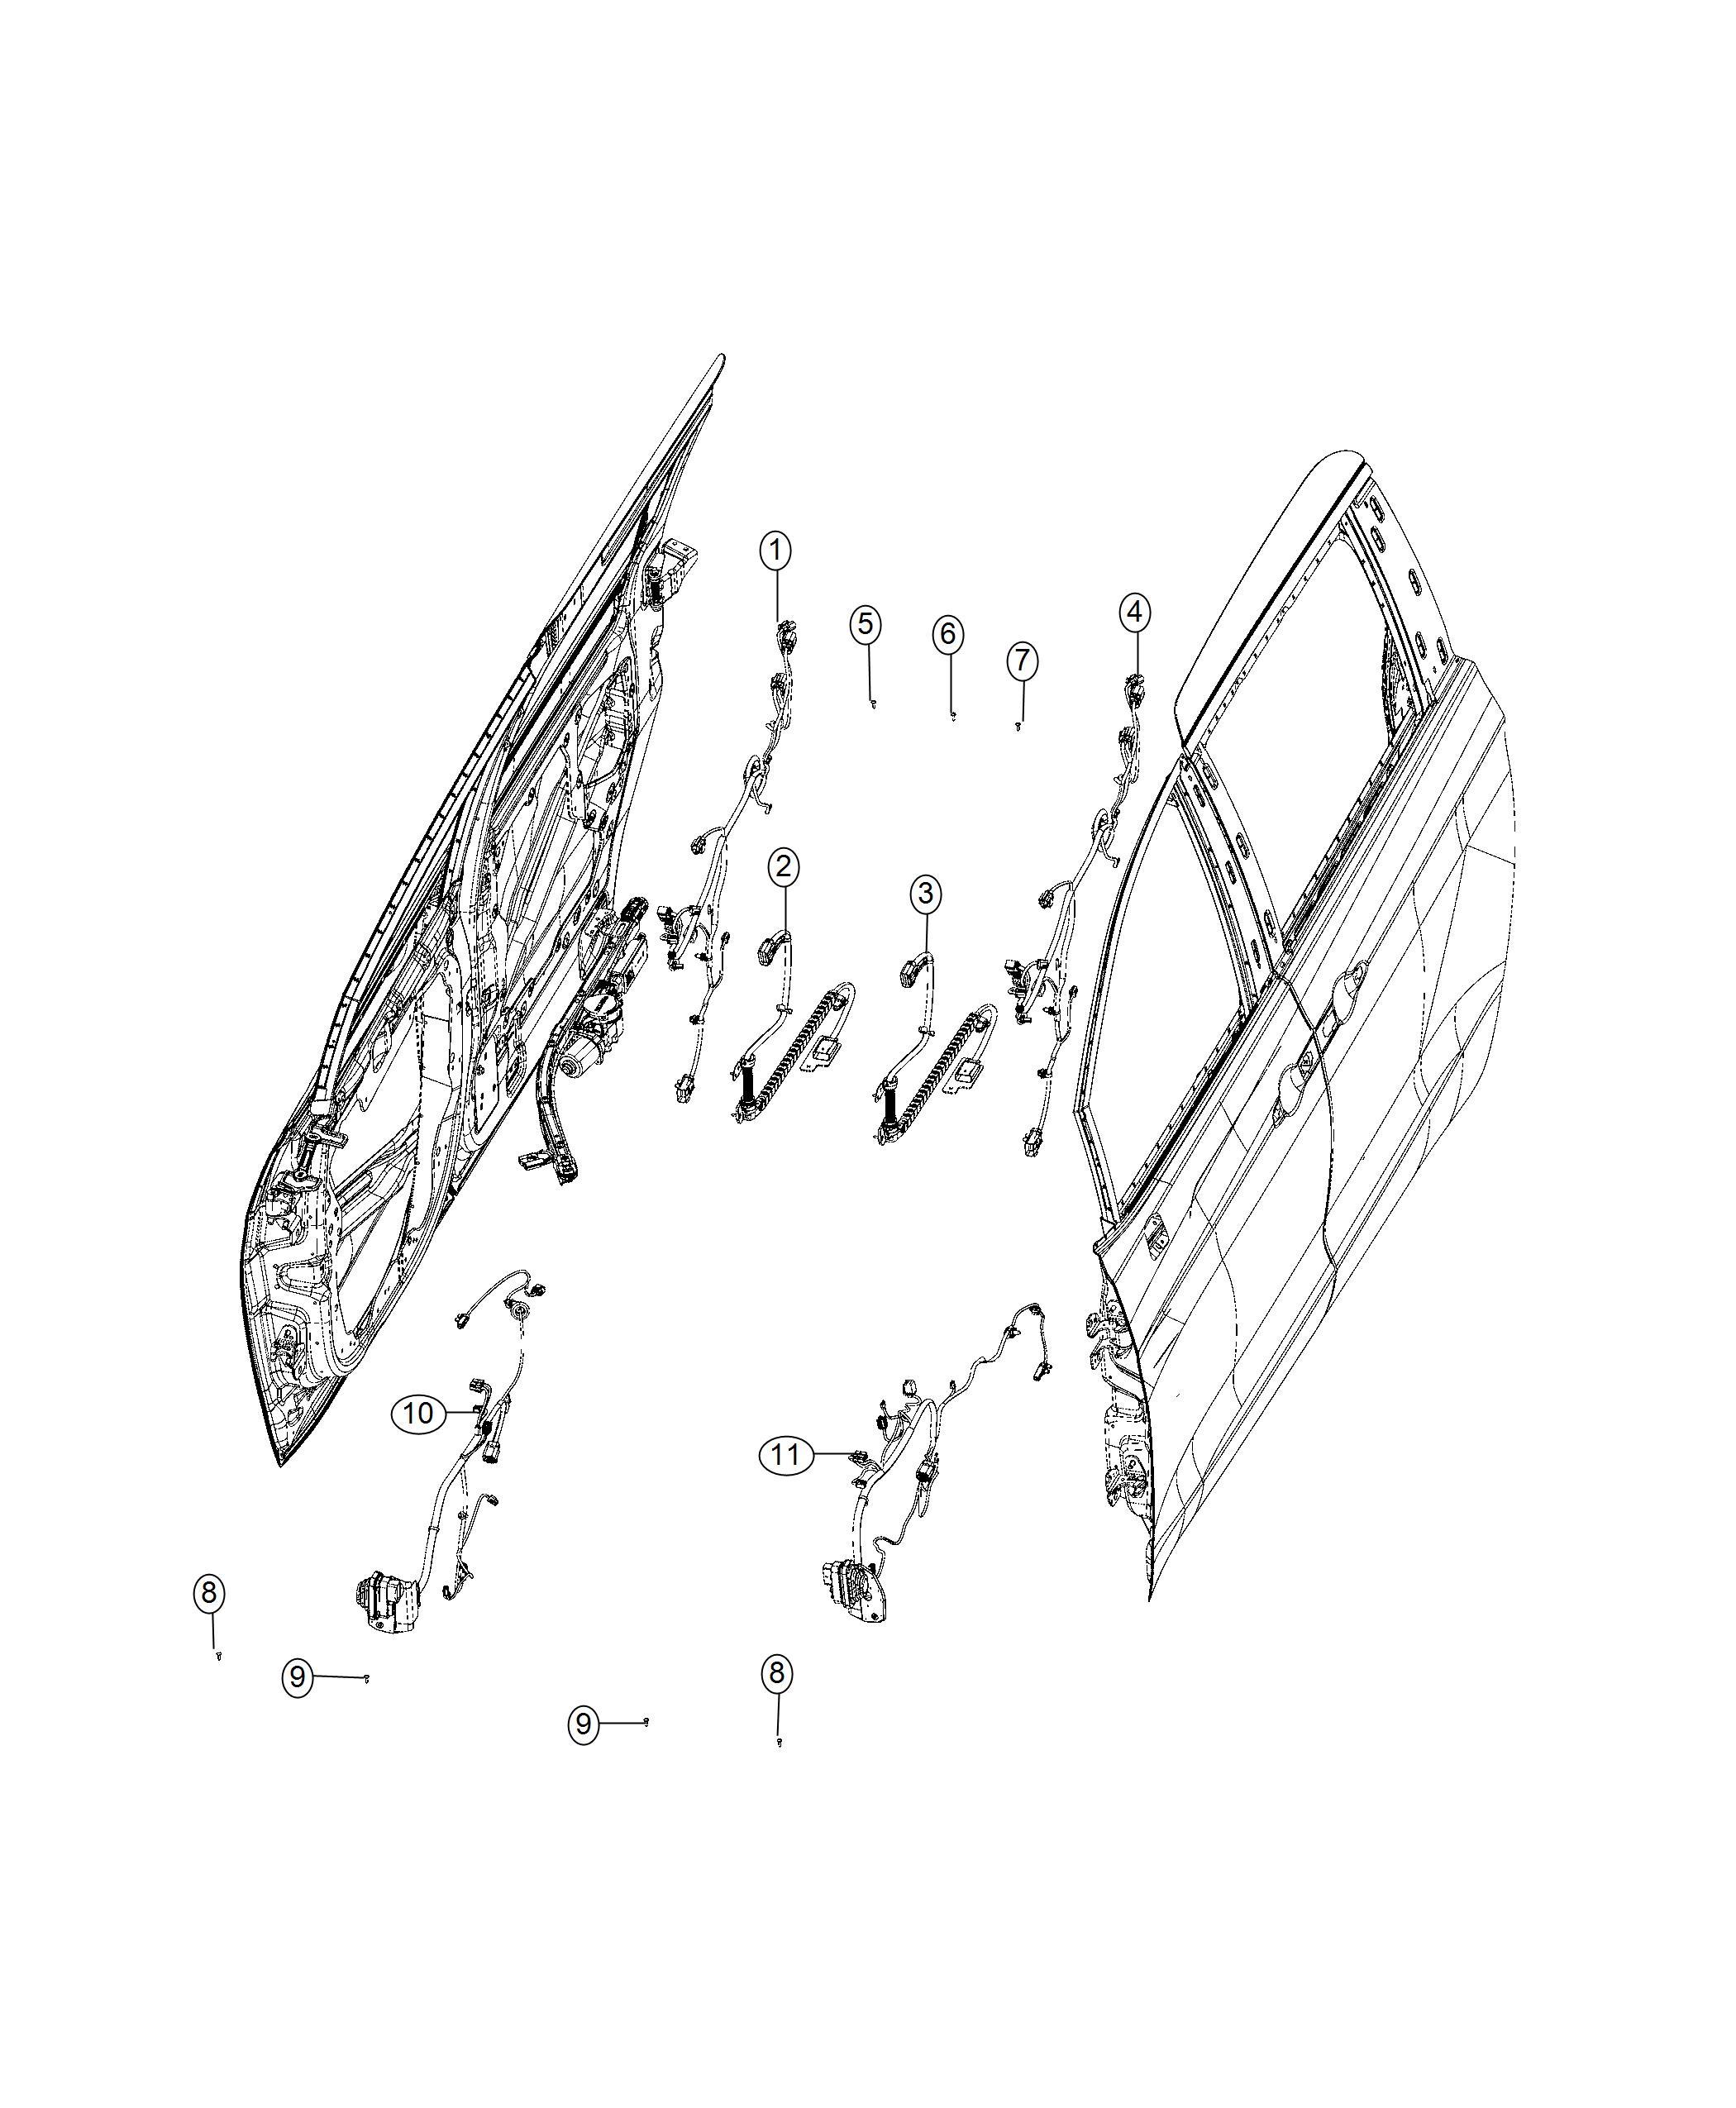 Chrysler Pacifica Wiring. Sliding door track. Right. [6